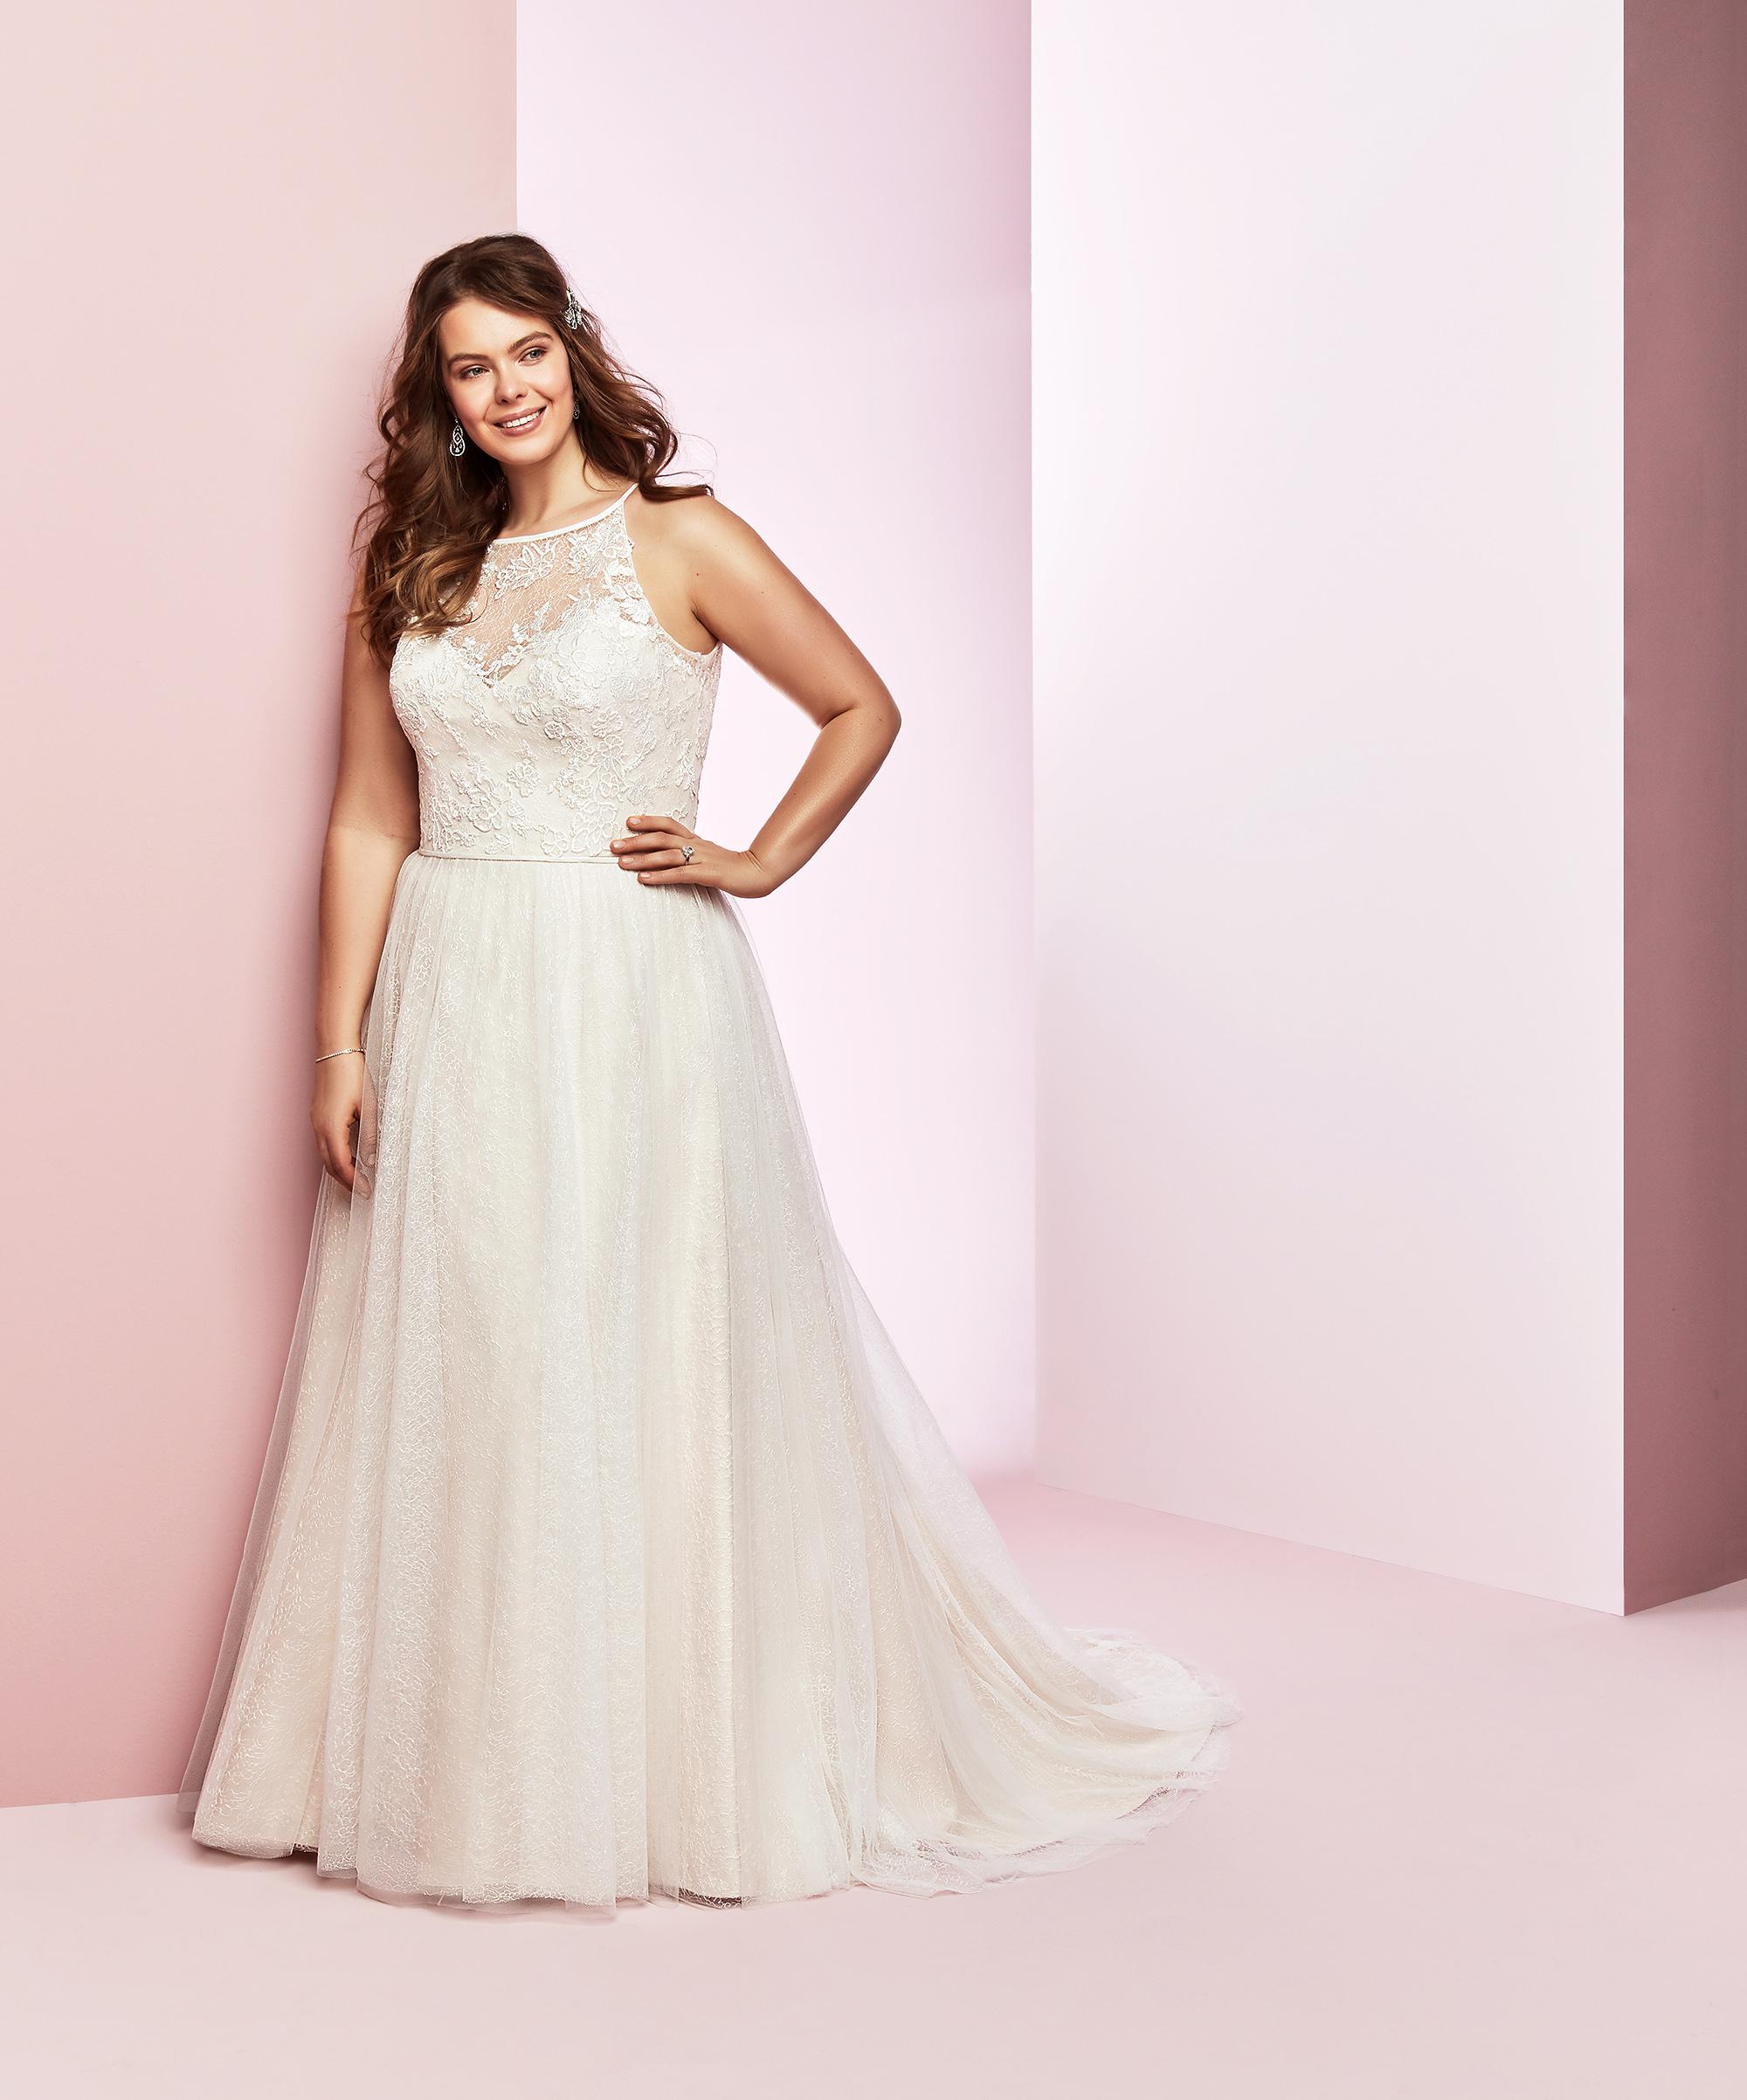 Rebecca Ingram wedding dress spring 2019 a-line high neckline lace